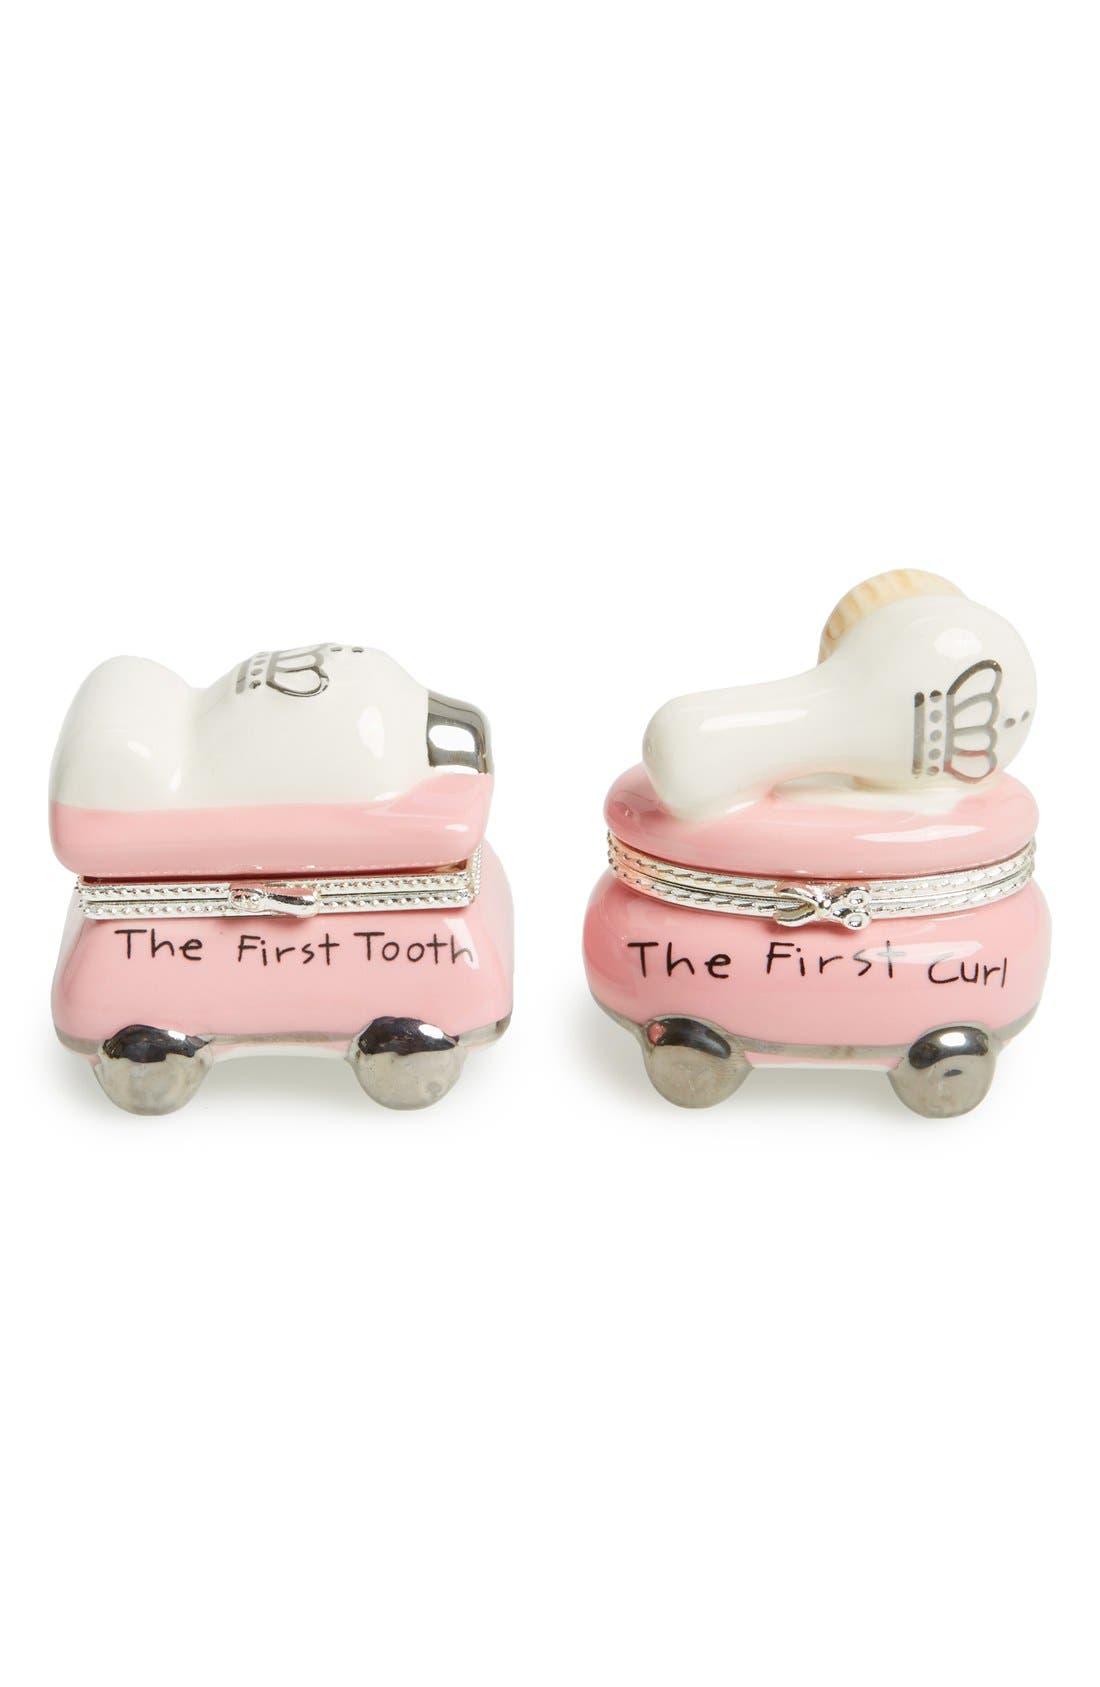 Main Image - Mud Pie 'Princess' First Tooth & Curl Treasure Box Set